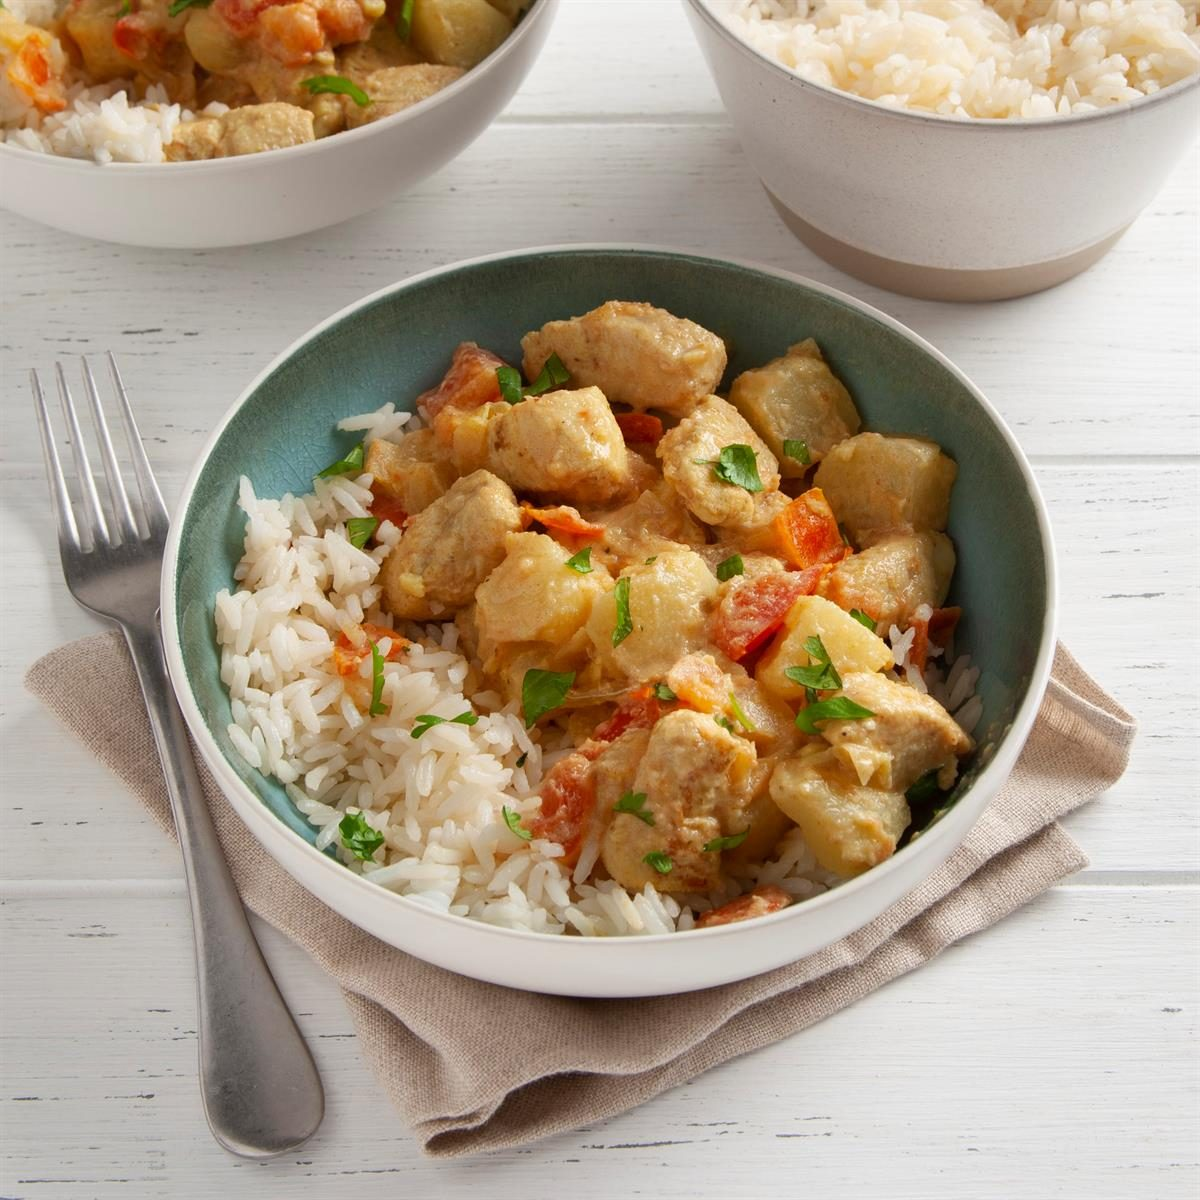 Tuesday: Chicken Korma